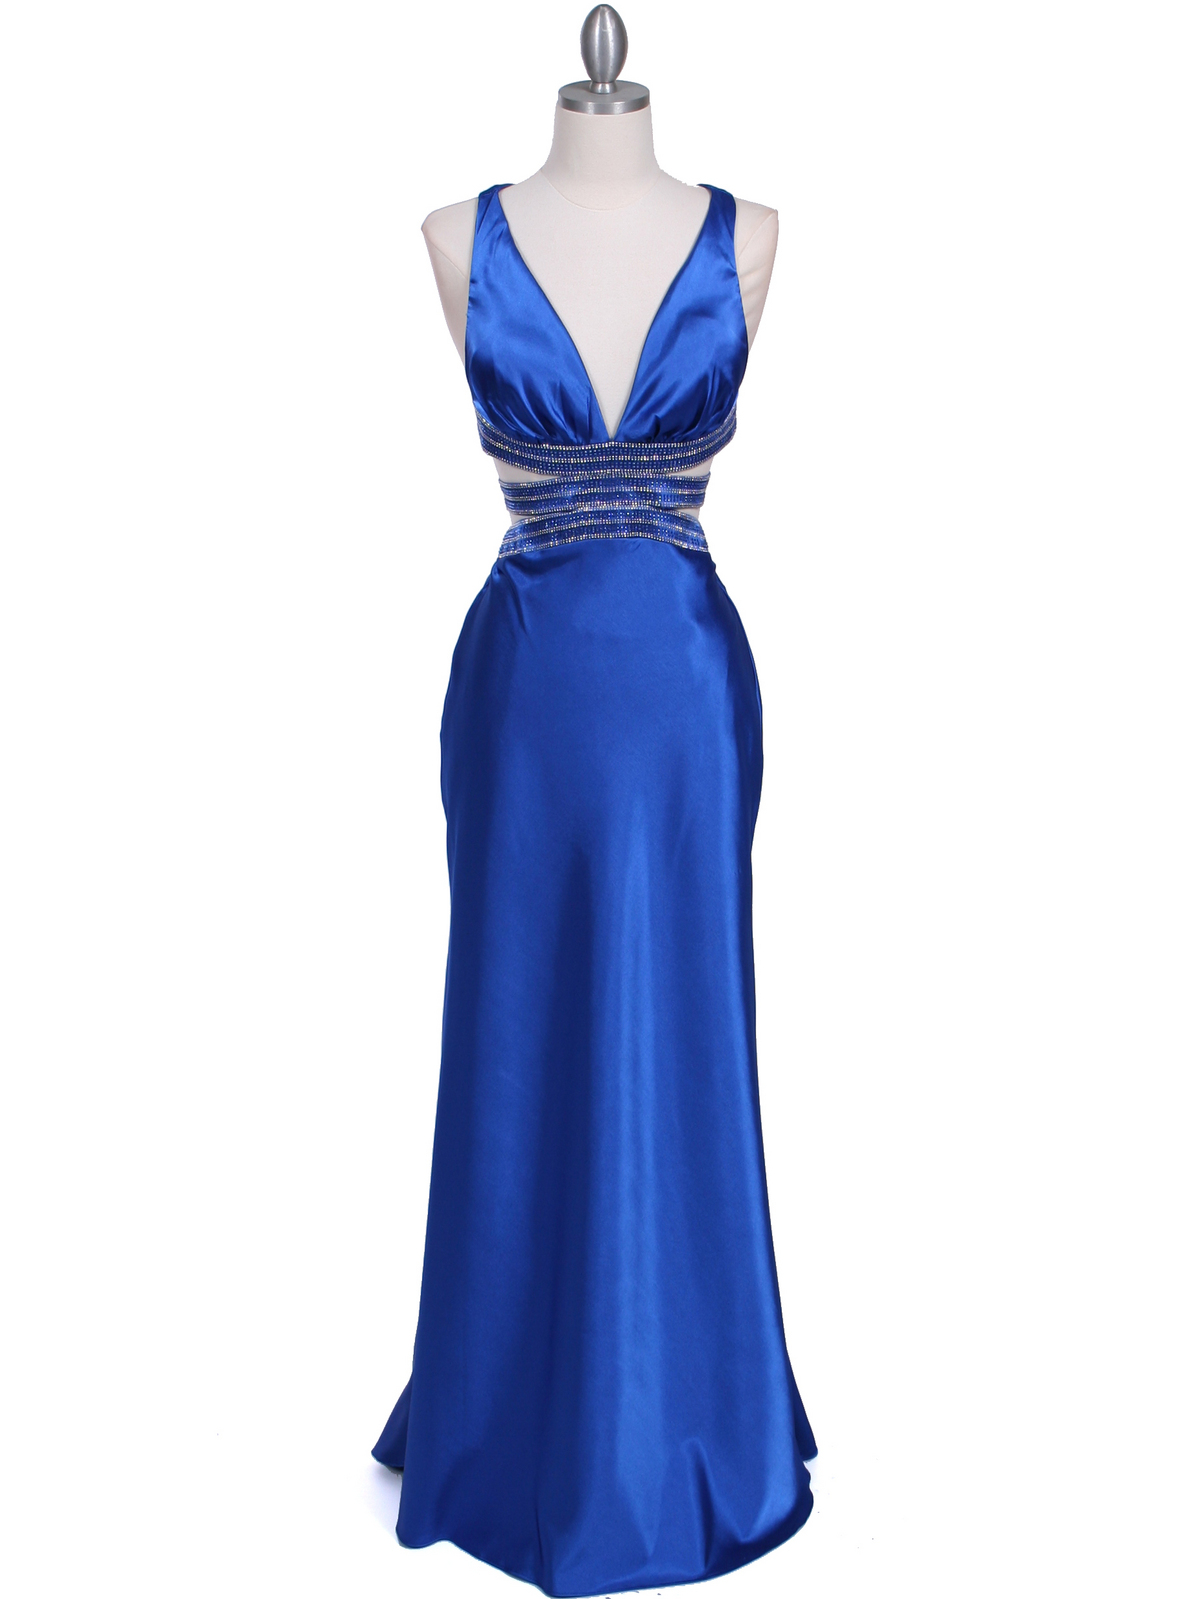 Royal blue satin cocktail dresses